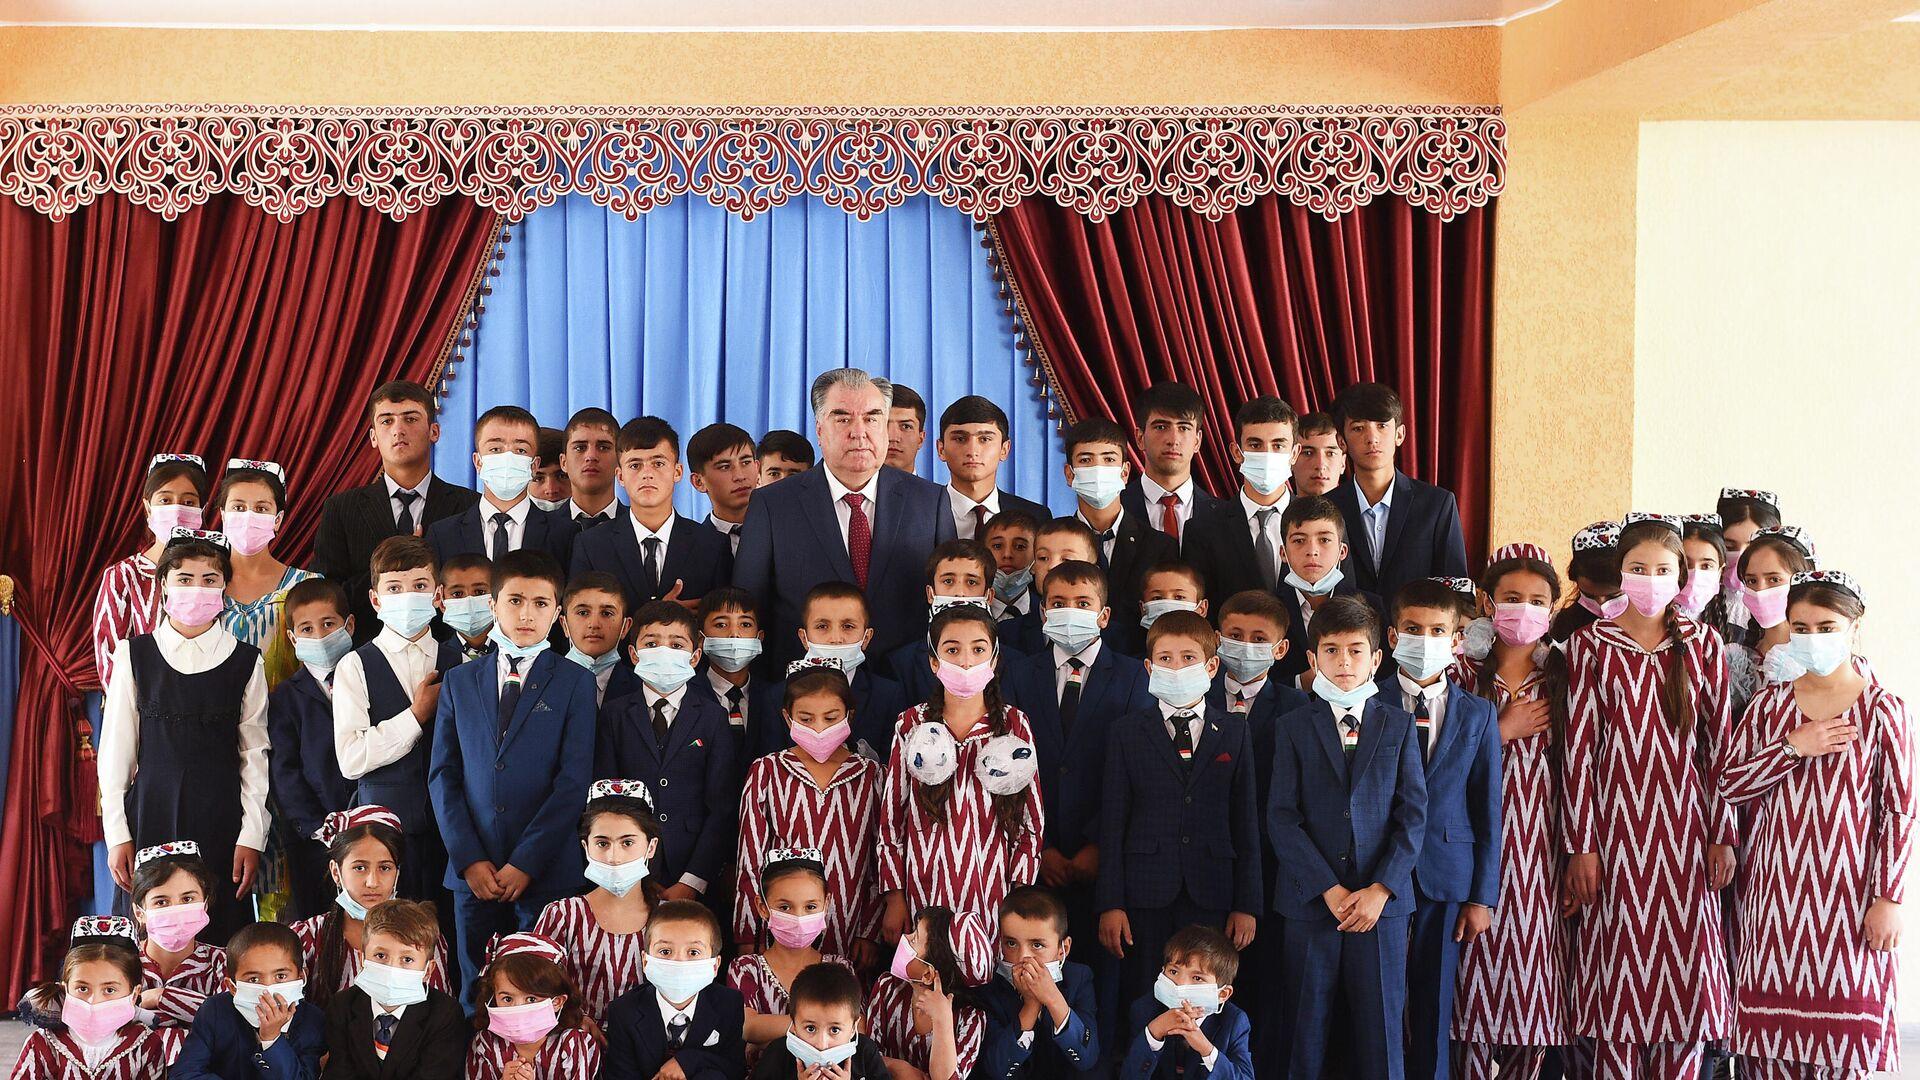 Президент Таджикистана Эмомали Рахмон встретился с сиротами Раштского района - Sputnik Таджикистан, 1920, 22.09.2021